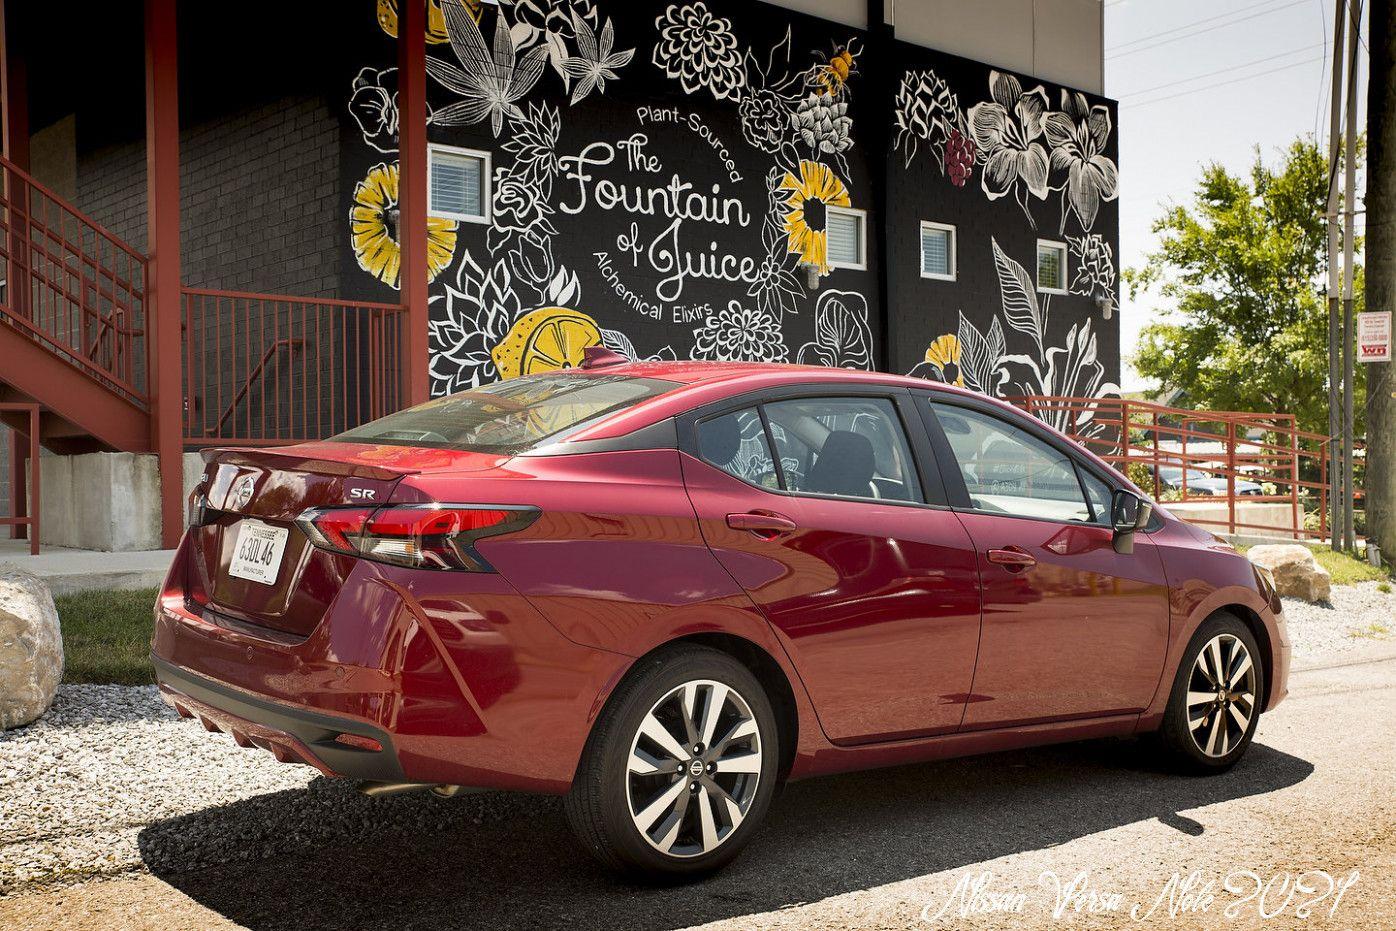 Nissan Versa Note 2021 Review In 2020 Nissan Versa Nissan Nissan Sentra